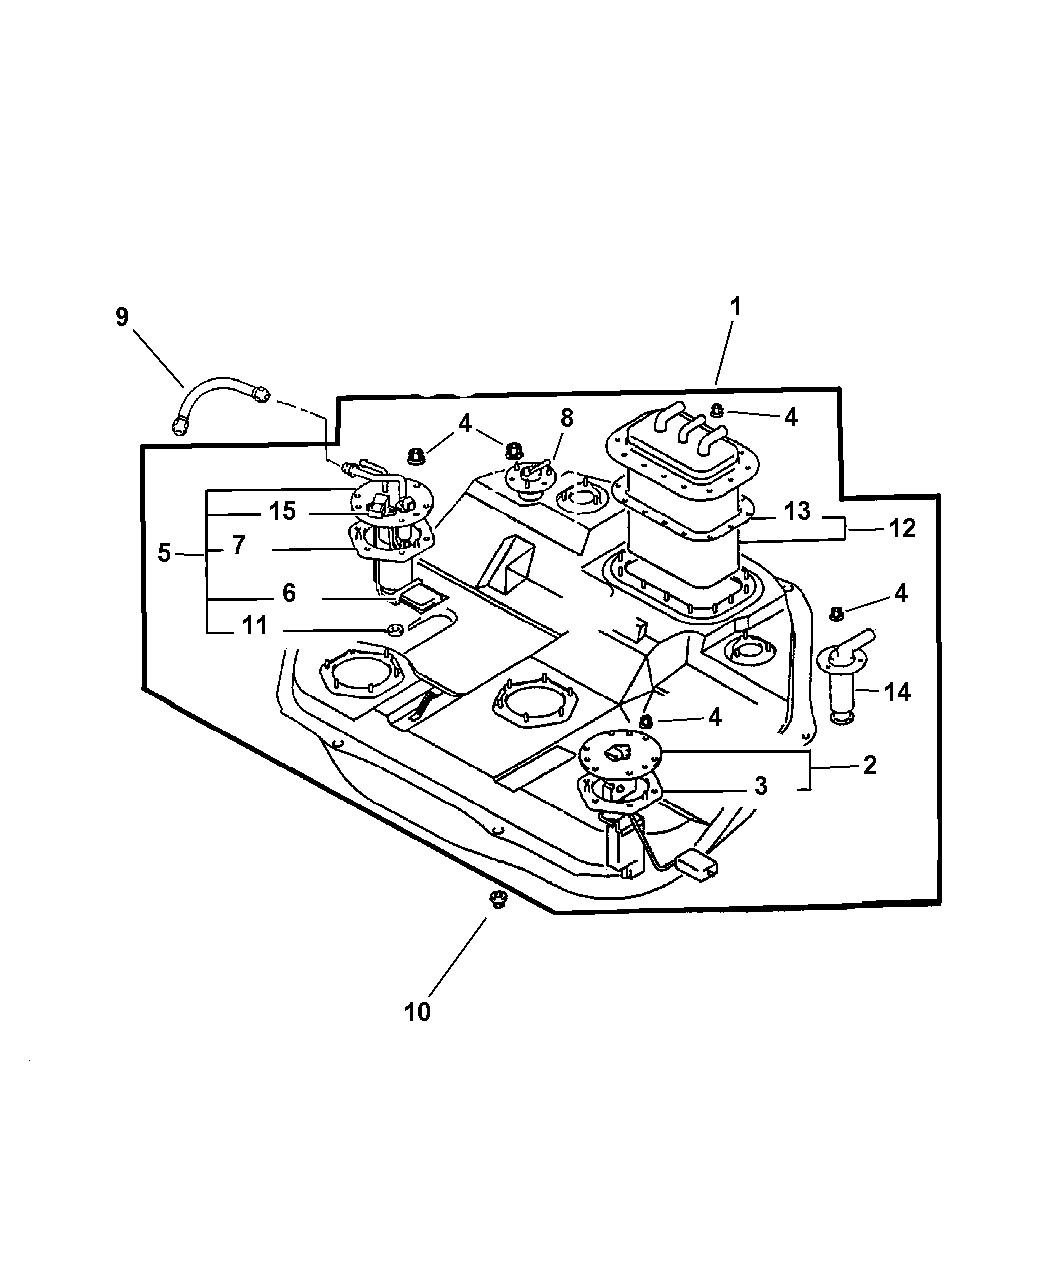 Chrysler Sebring Coupe Fuel Tank Amp Pump